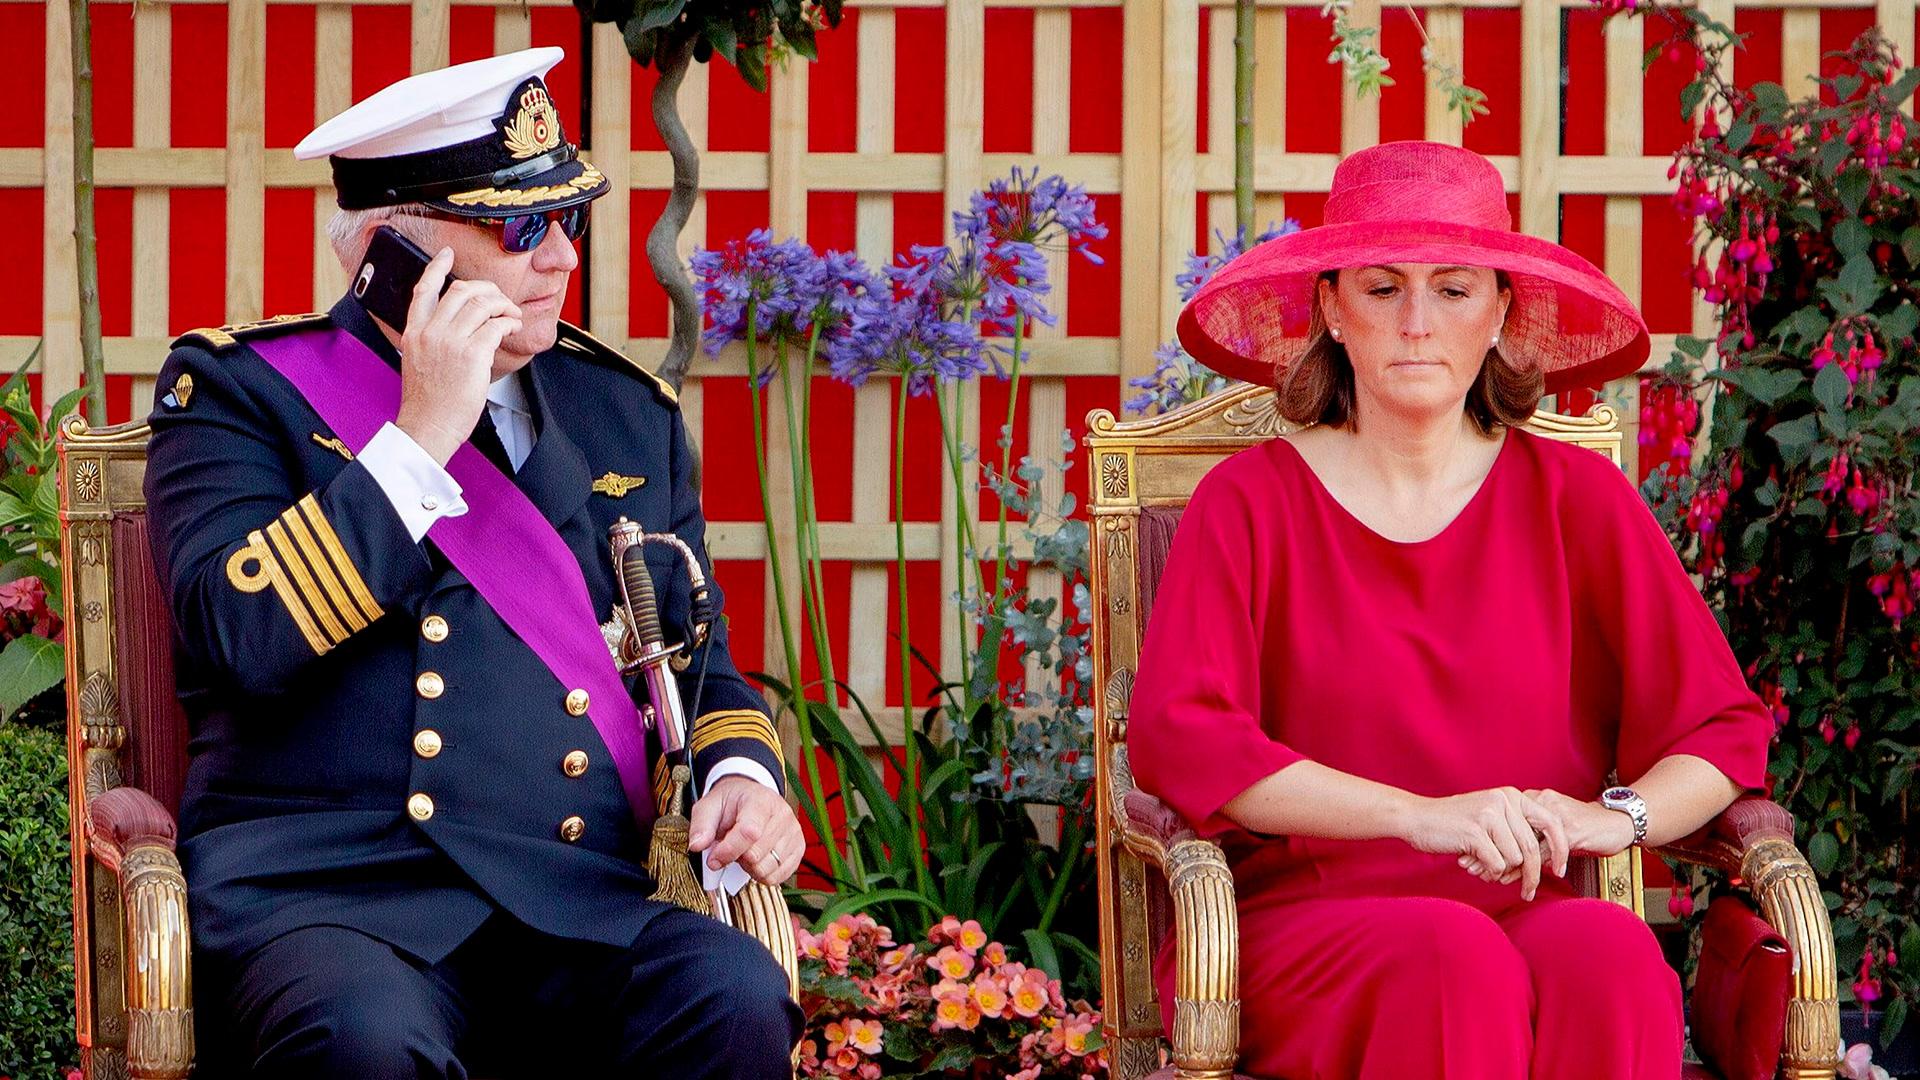 La polémica actitud de Laurent de Bélgica durante el desfile nacional